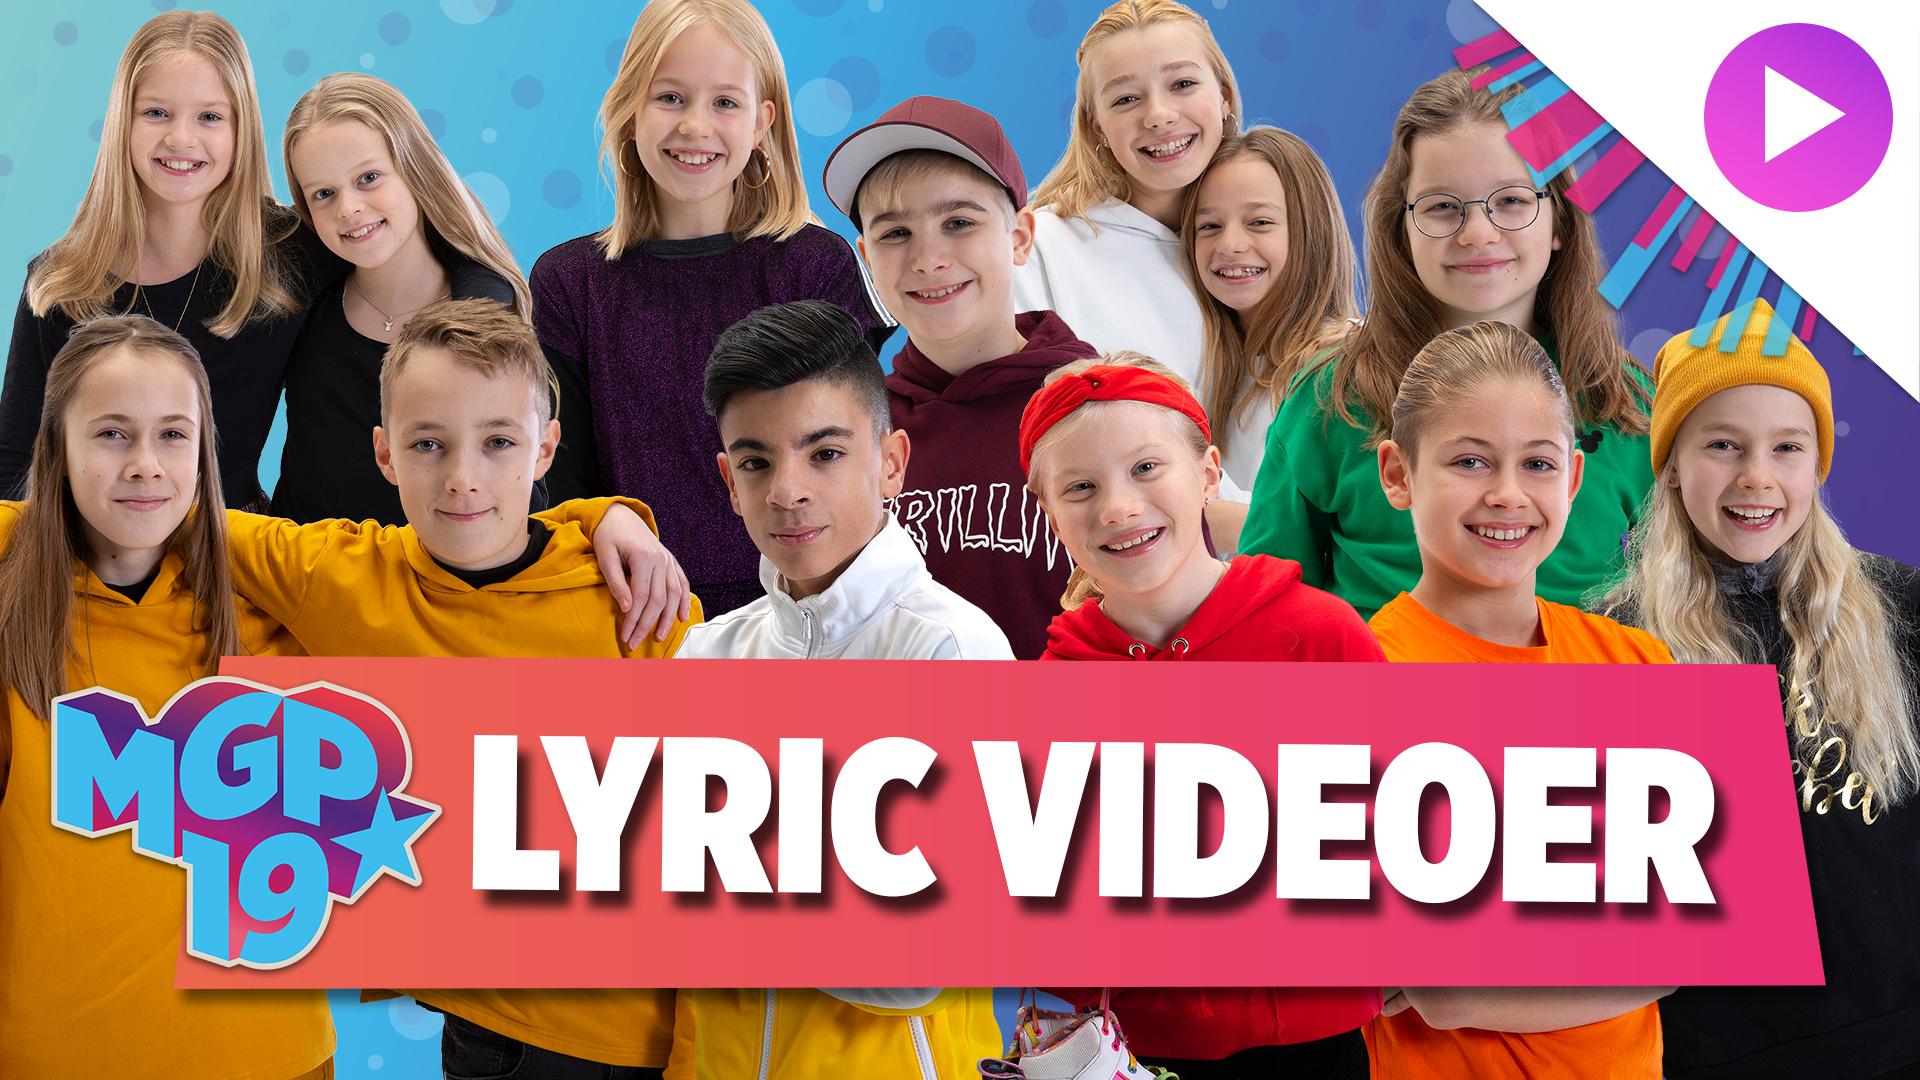 musikvideo_lyric_drupal_0.jpg